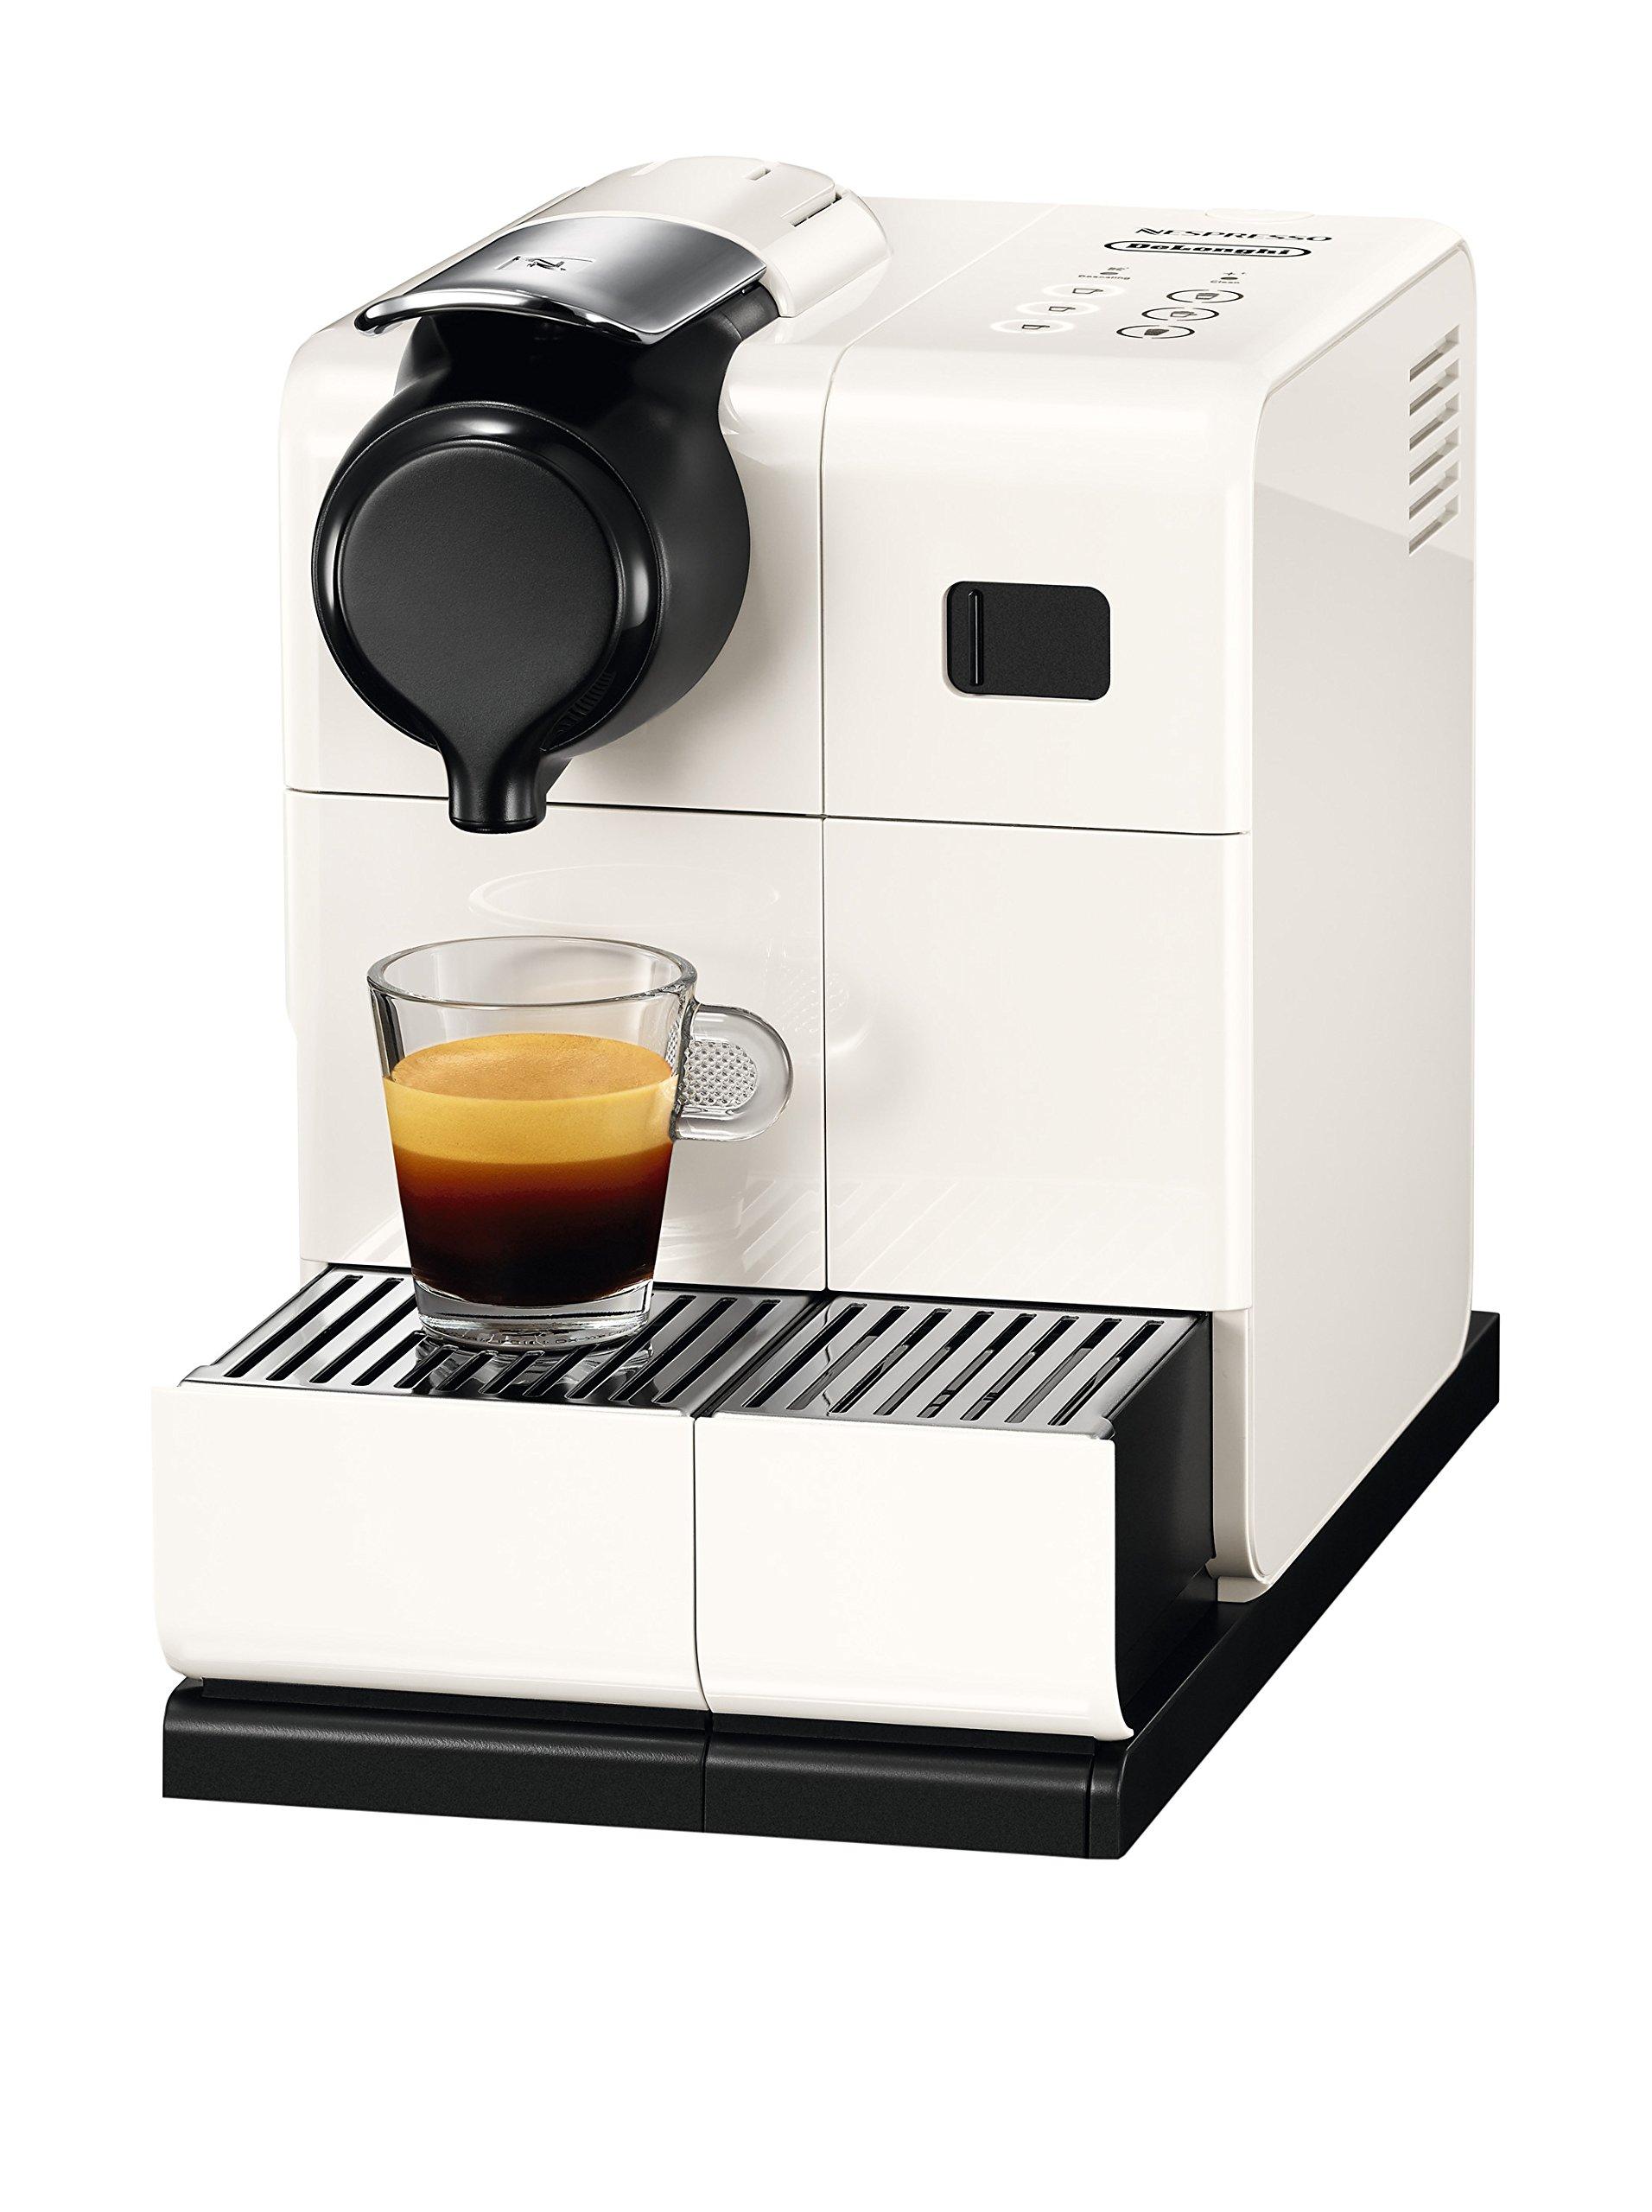 DeLonghi-Nespresso-EN-550-Lattissima-Touch-Kapselmaschine-1400-Watt-inklusiv-Welcome-Pack-mit-16-Kapseln